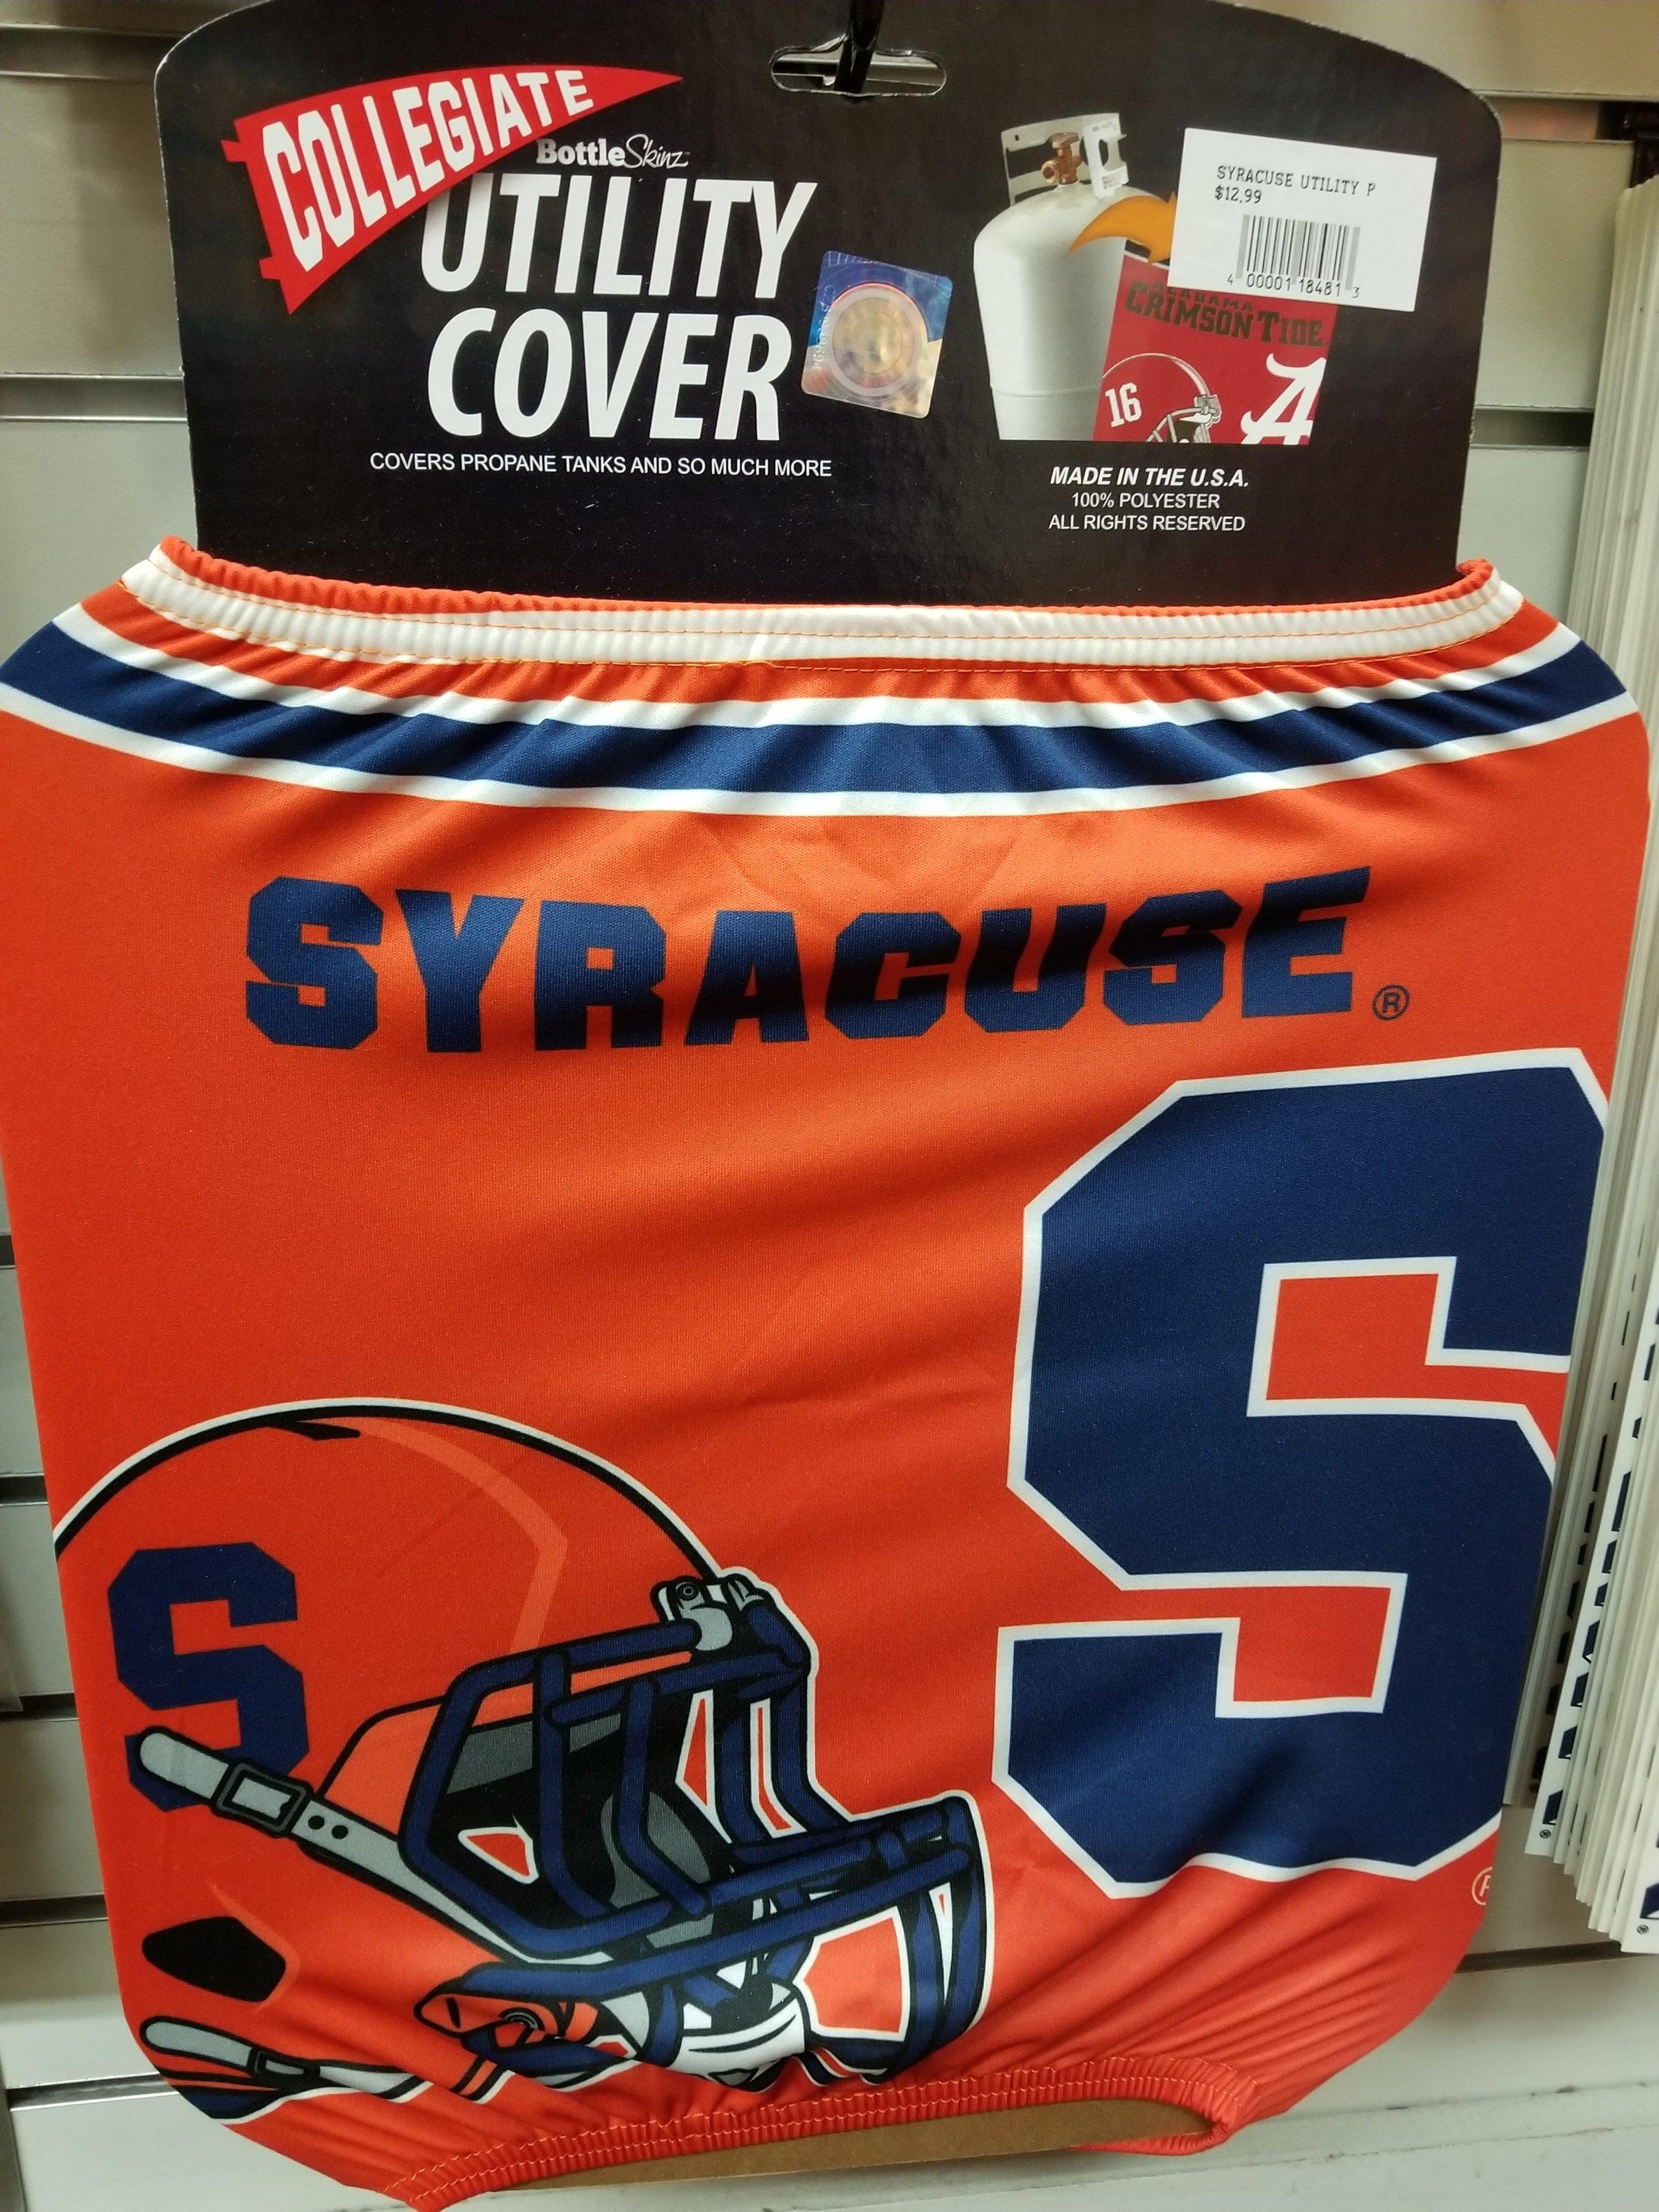 syracuse utility cover